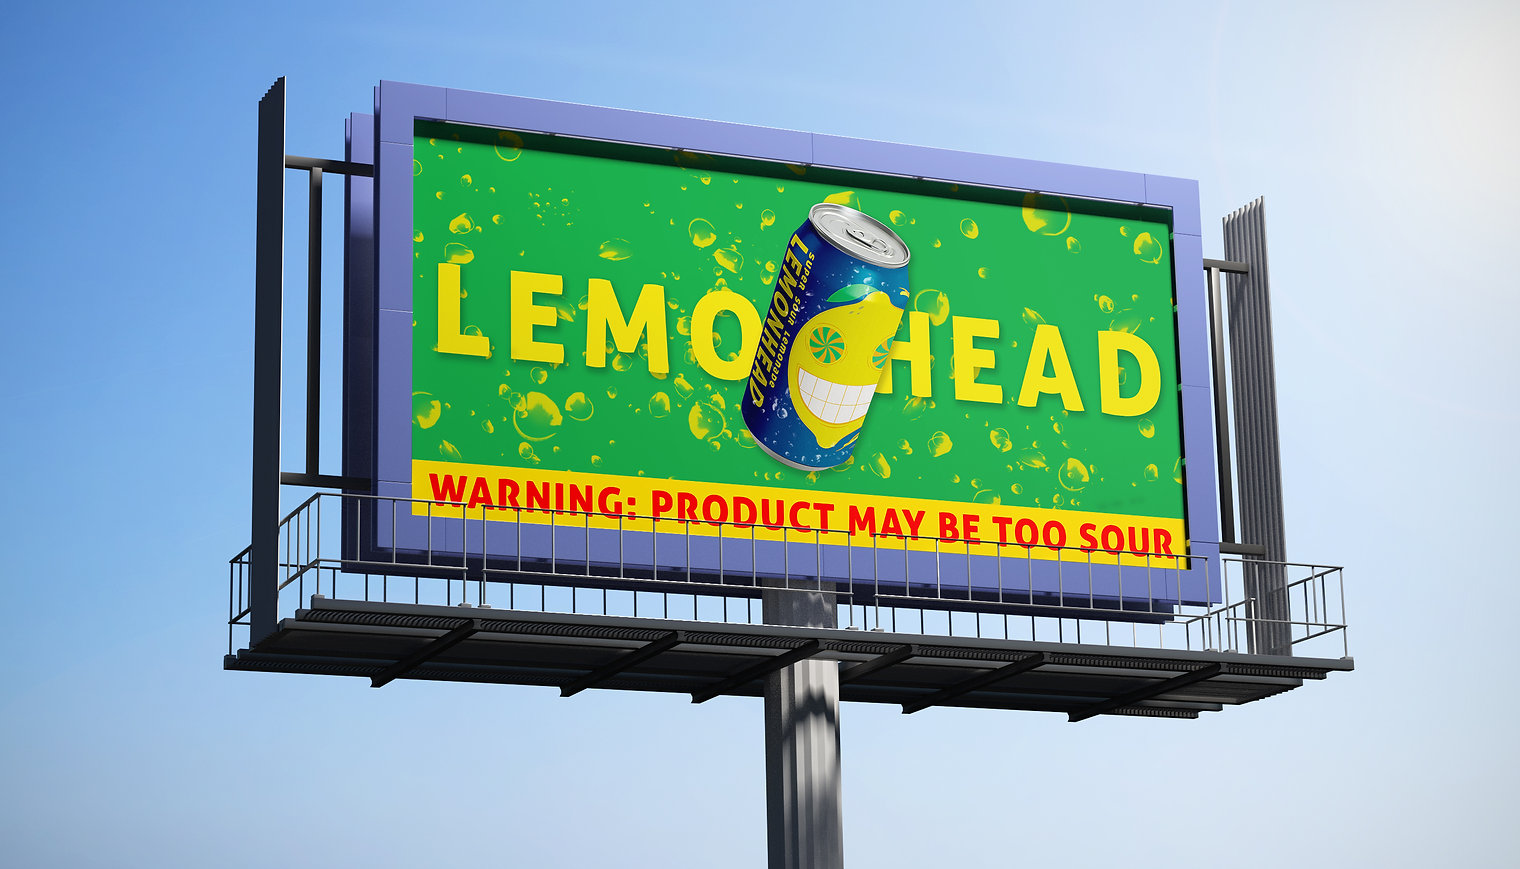 LeamonHead_Billboard_1.jpg